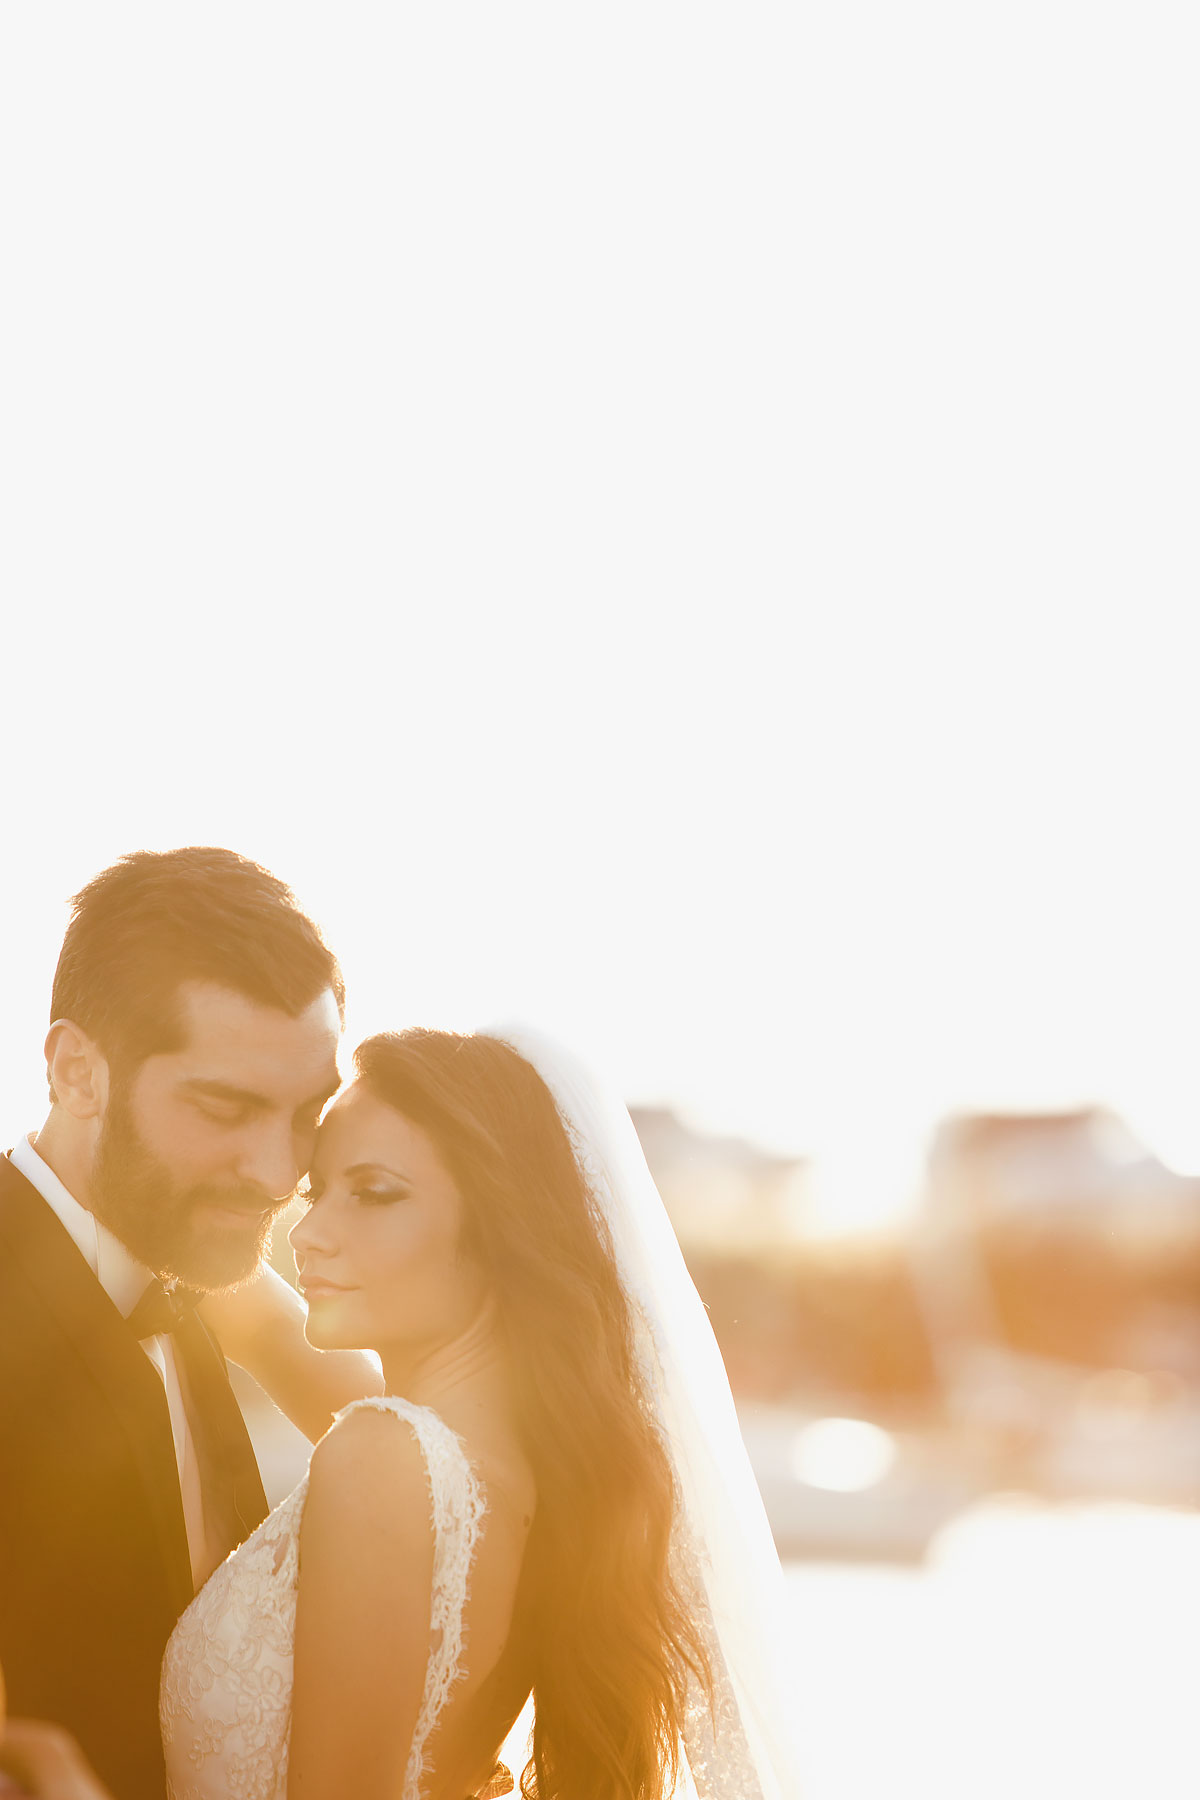 56c4P2photography_wedding_Greece_Dimitris_Maria_2642.jpg